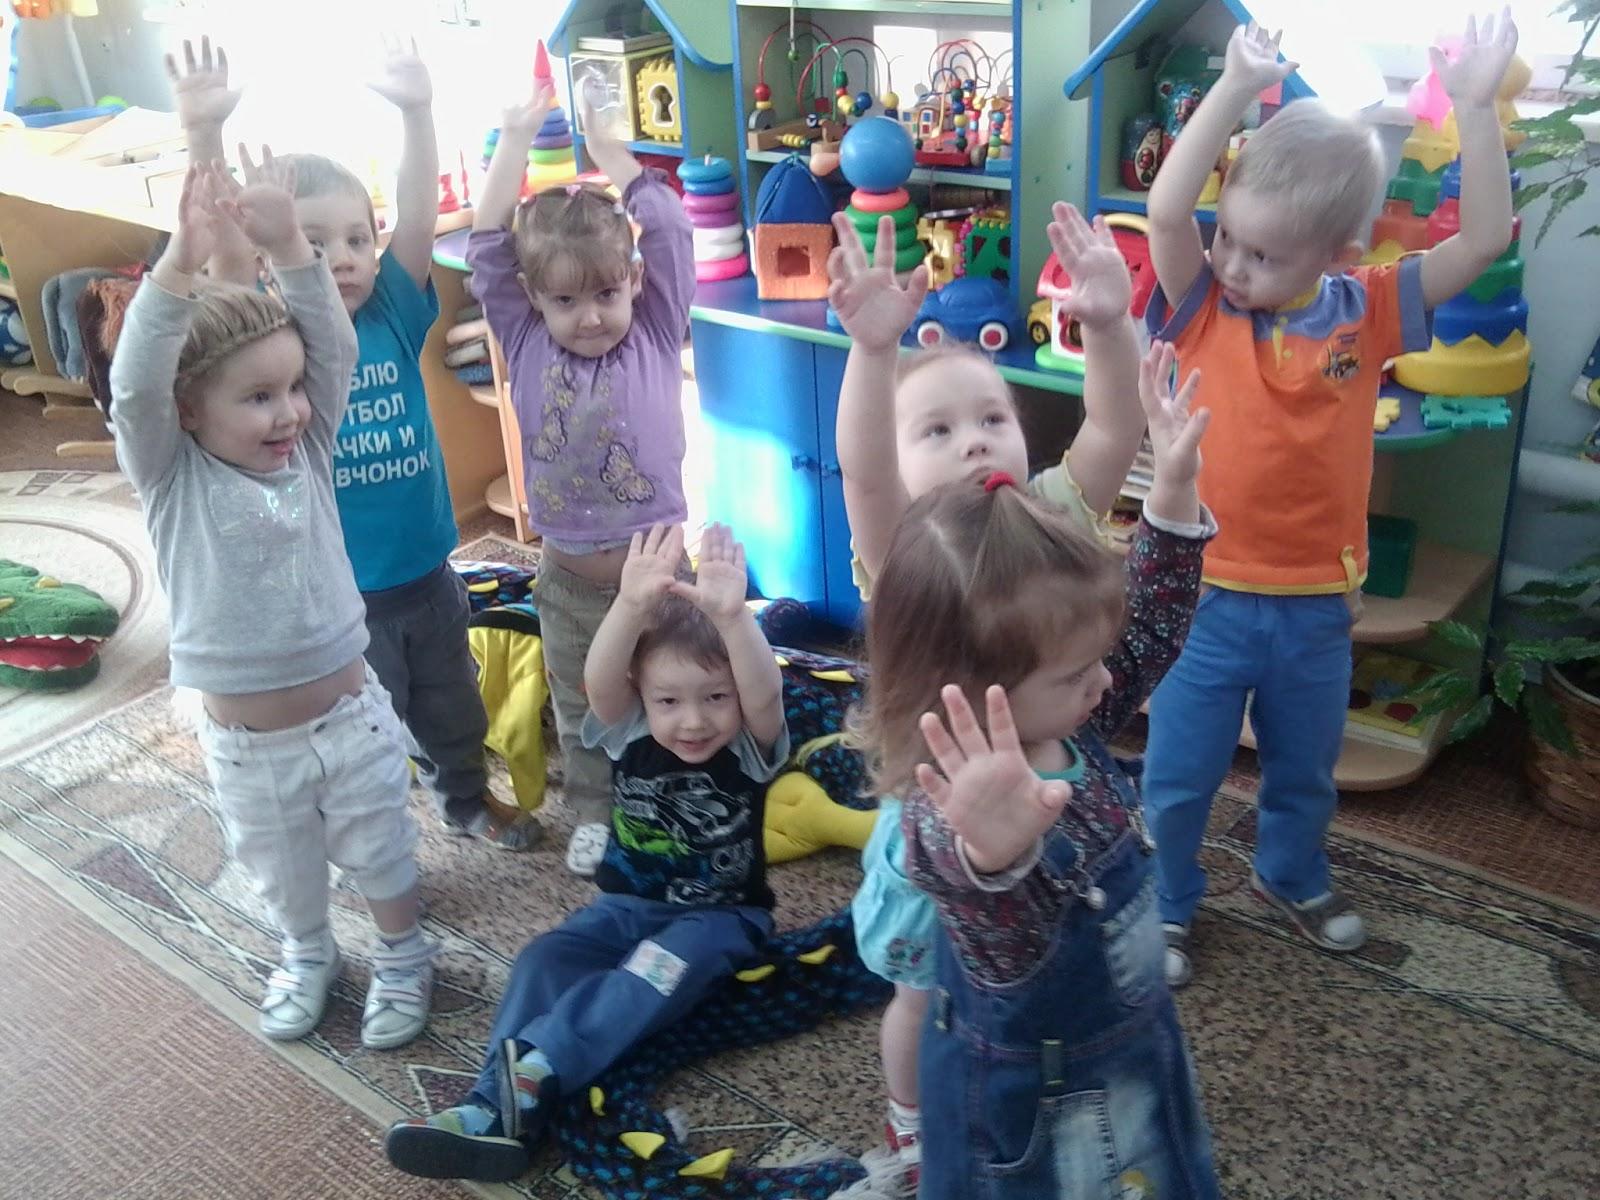 Хороших, картинки младшая группа детского сада